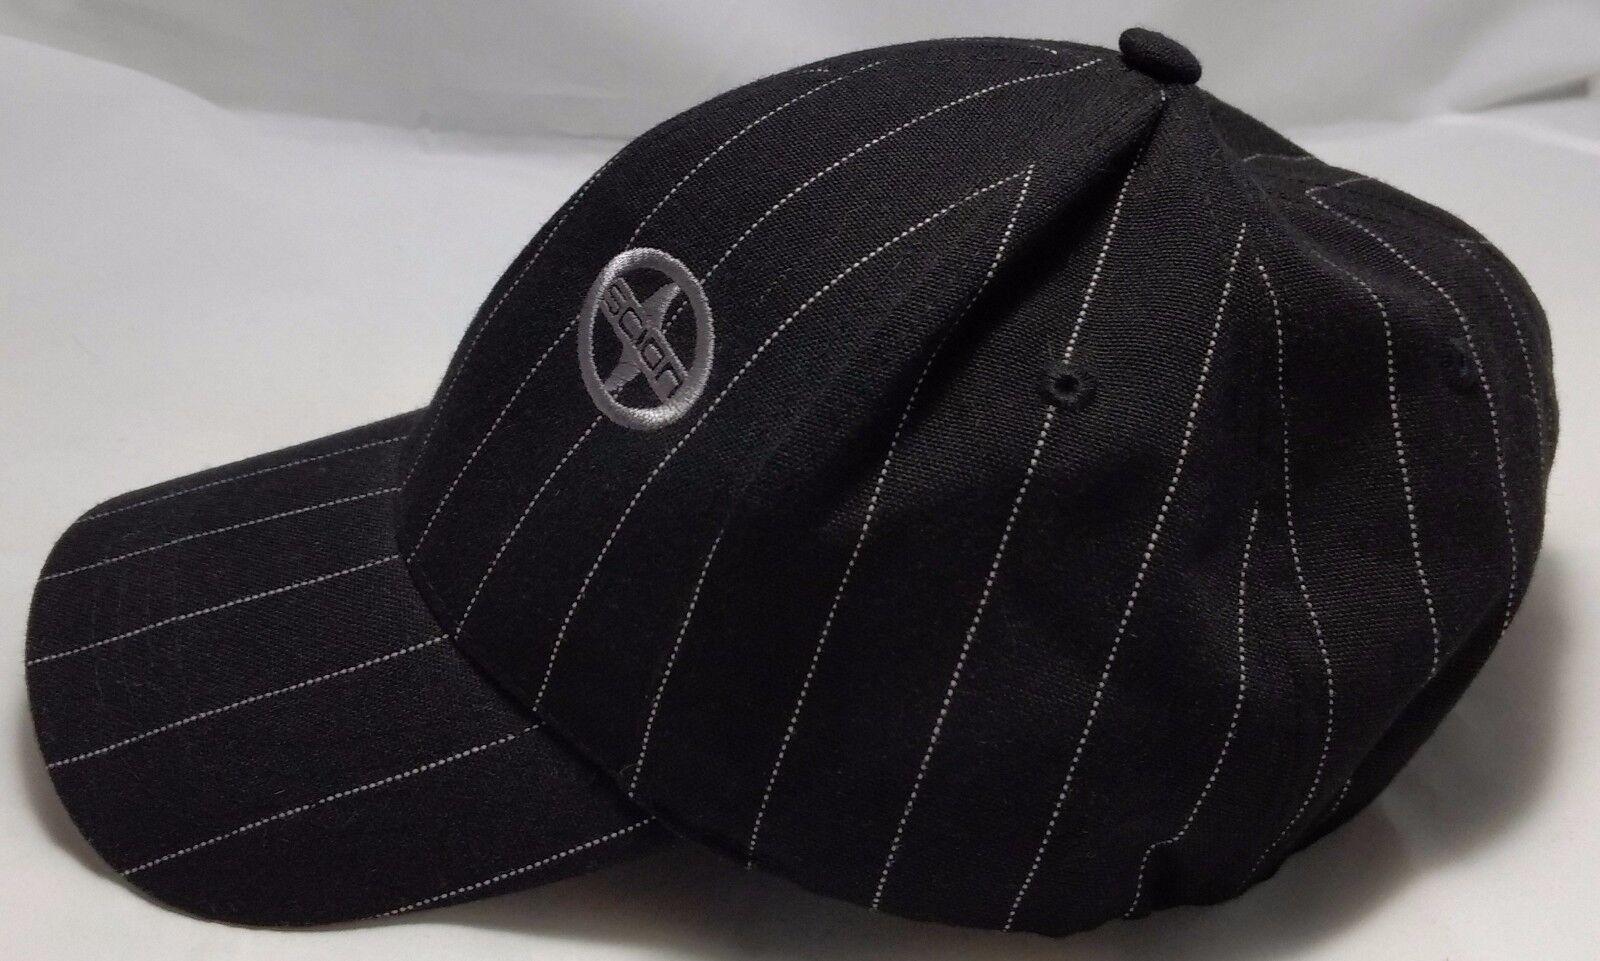 SCION AUTOMOBILE adjustable hat cap adjustable AUTOMOBILE black striped toyota racing xd xb tc iq 790390